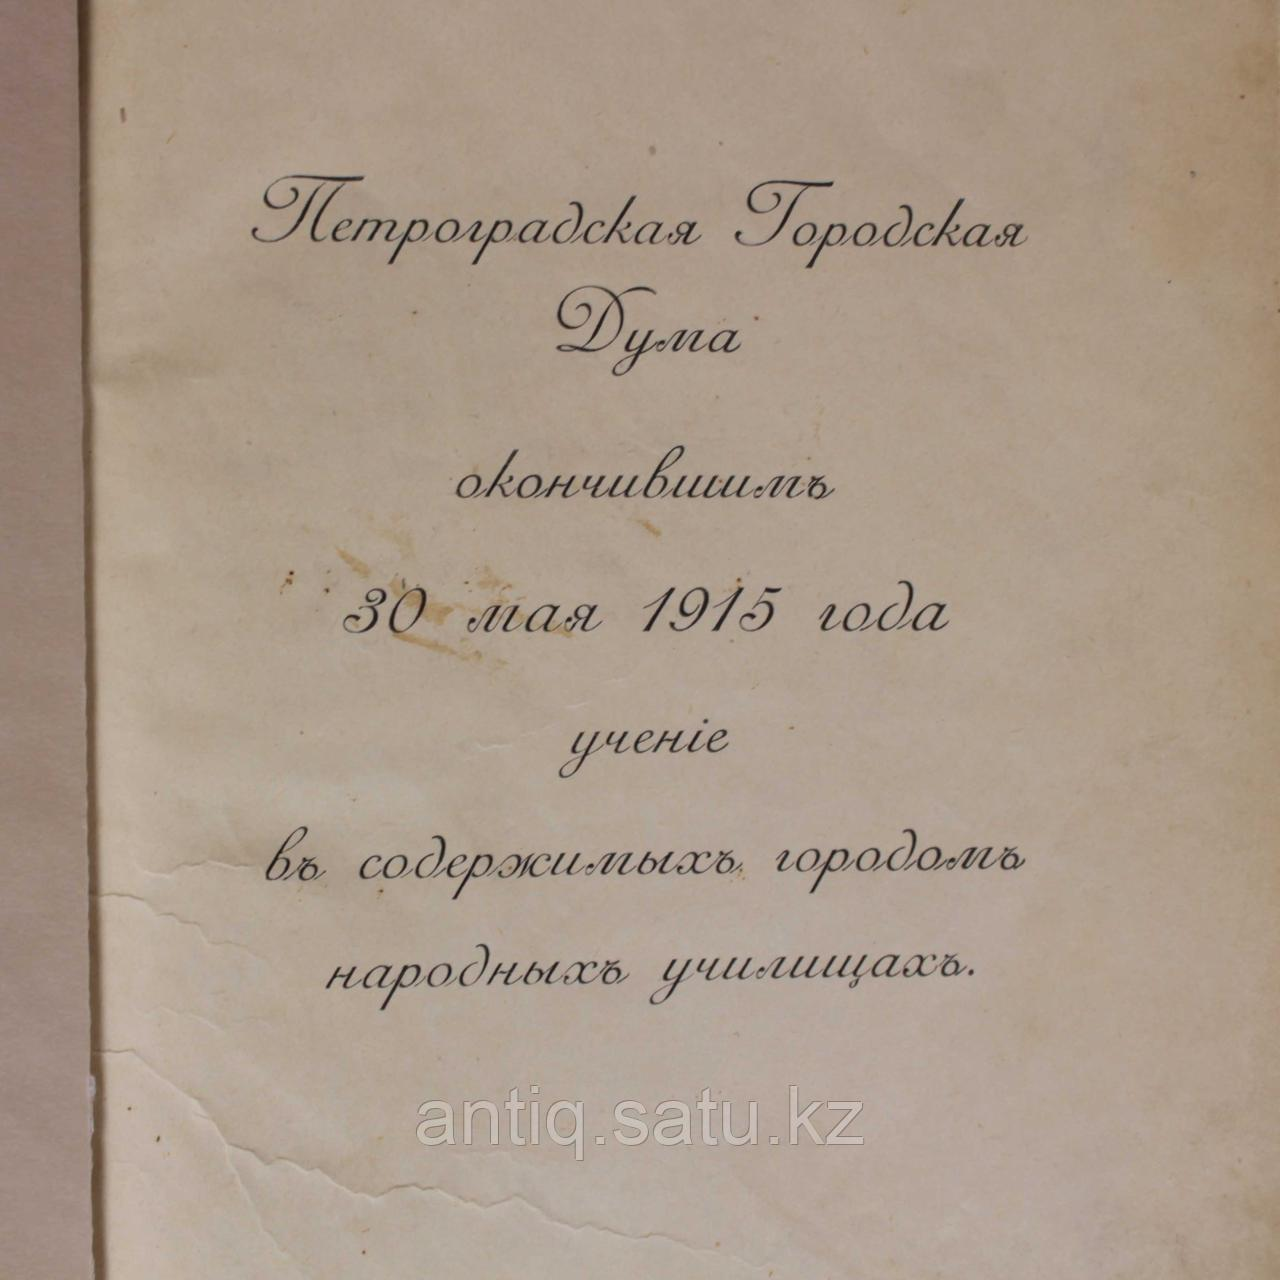 Произведения Михаила Юрьевича Лермонтова - фото 2